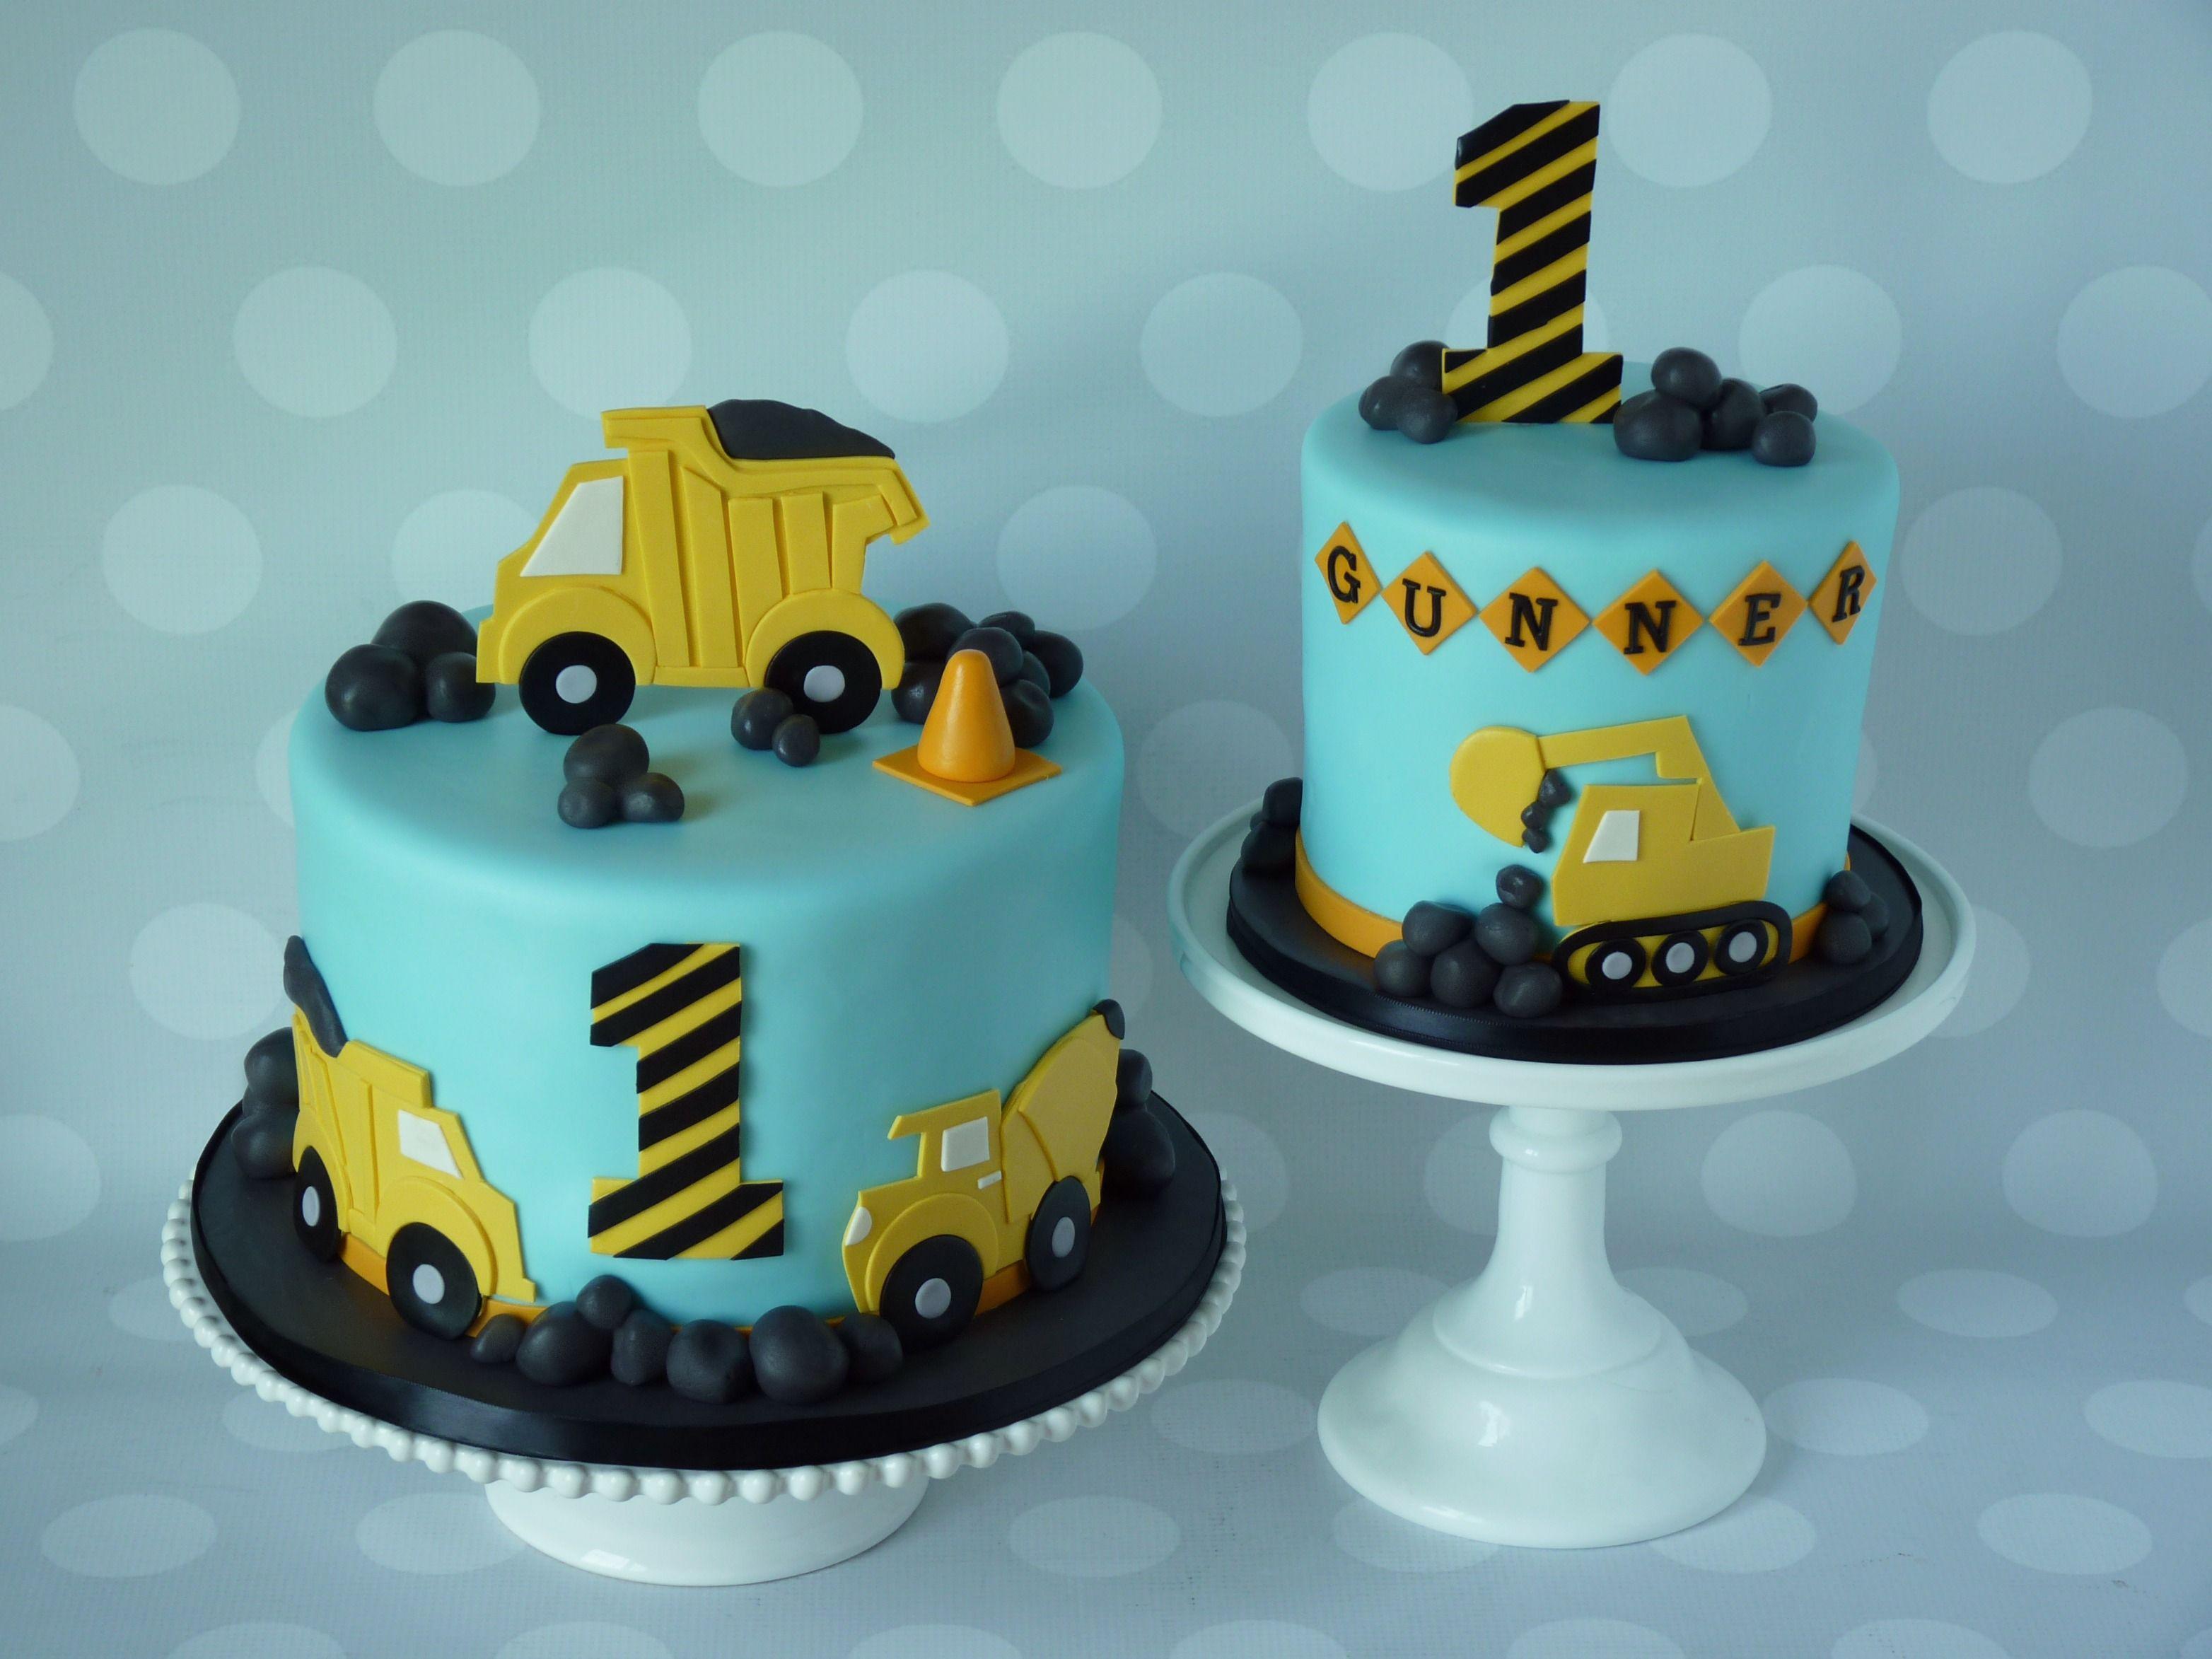 Tremendous Pin By Maria Ferrer Esteves On Construction Birthday Party Funny Birthday Cards Online Necthendildamsfinfo